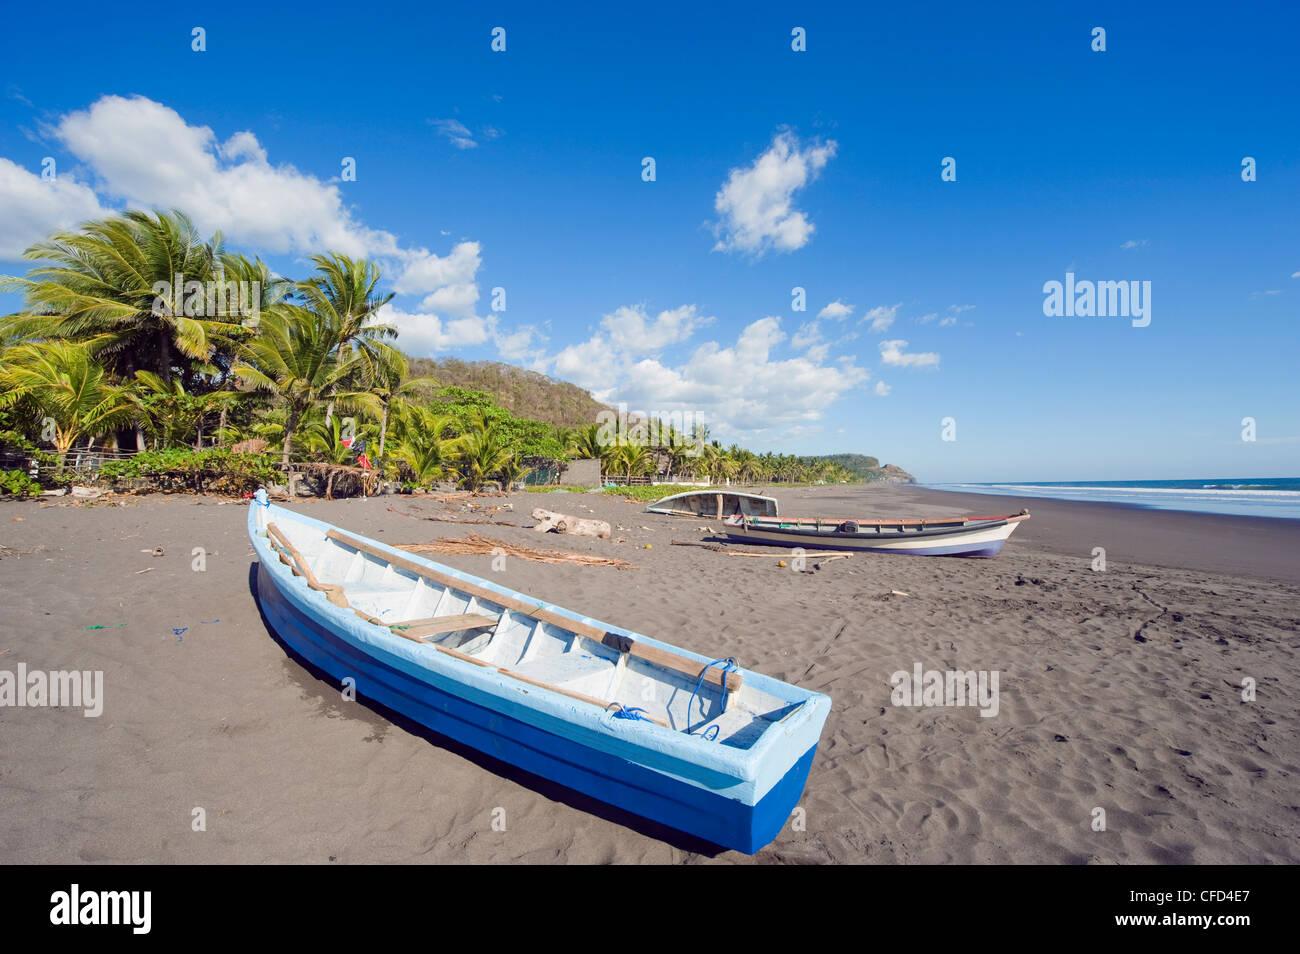 Fishing boats on the beach at Playa Sihuapilapa, Pacific Coast, El Salvador, Central America Stock Photo